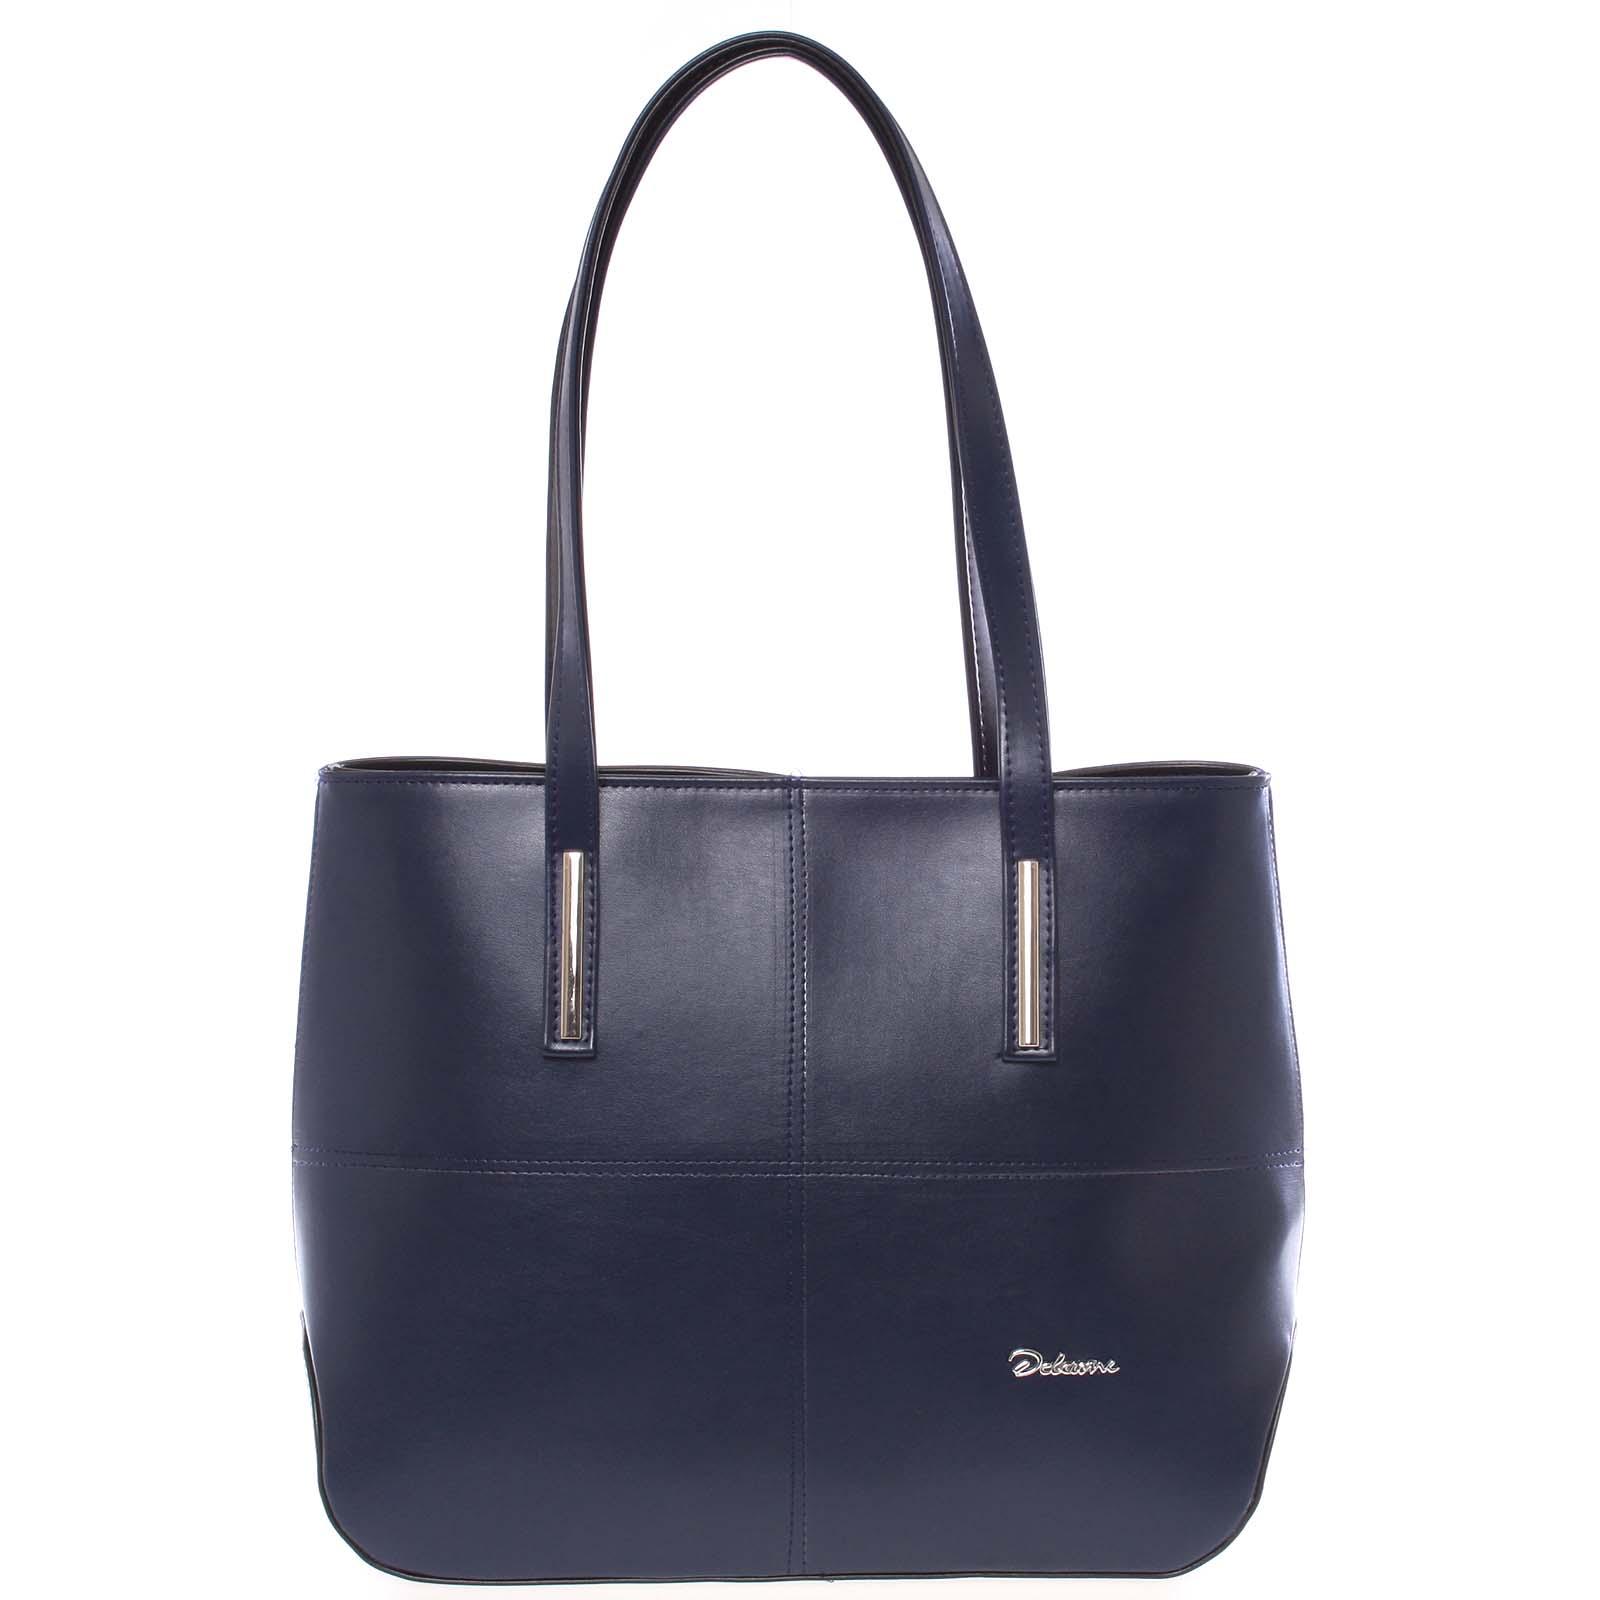 Dámska luxusná kabelka cez rameno tmavomodrá - Delami Leonela modrá